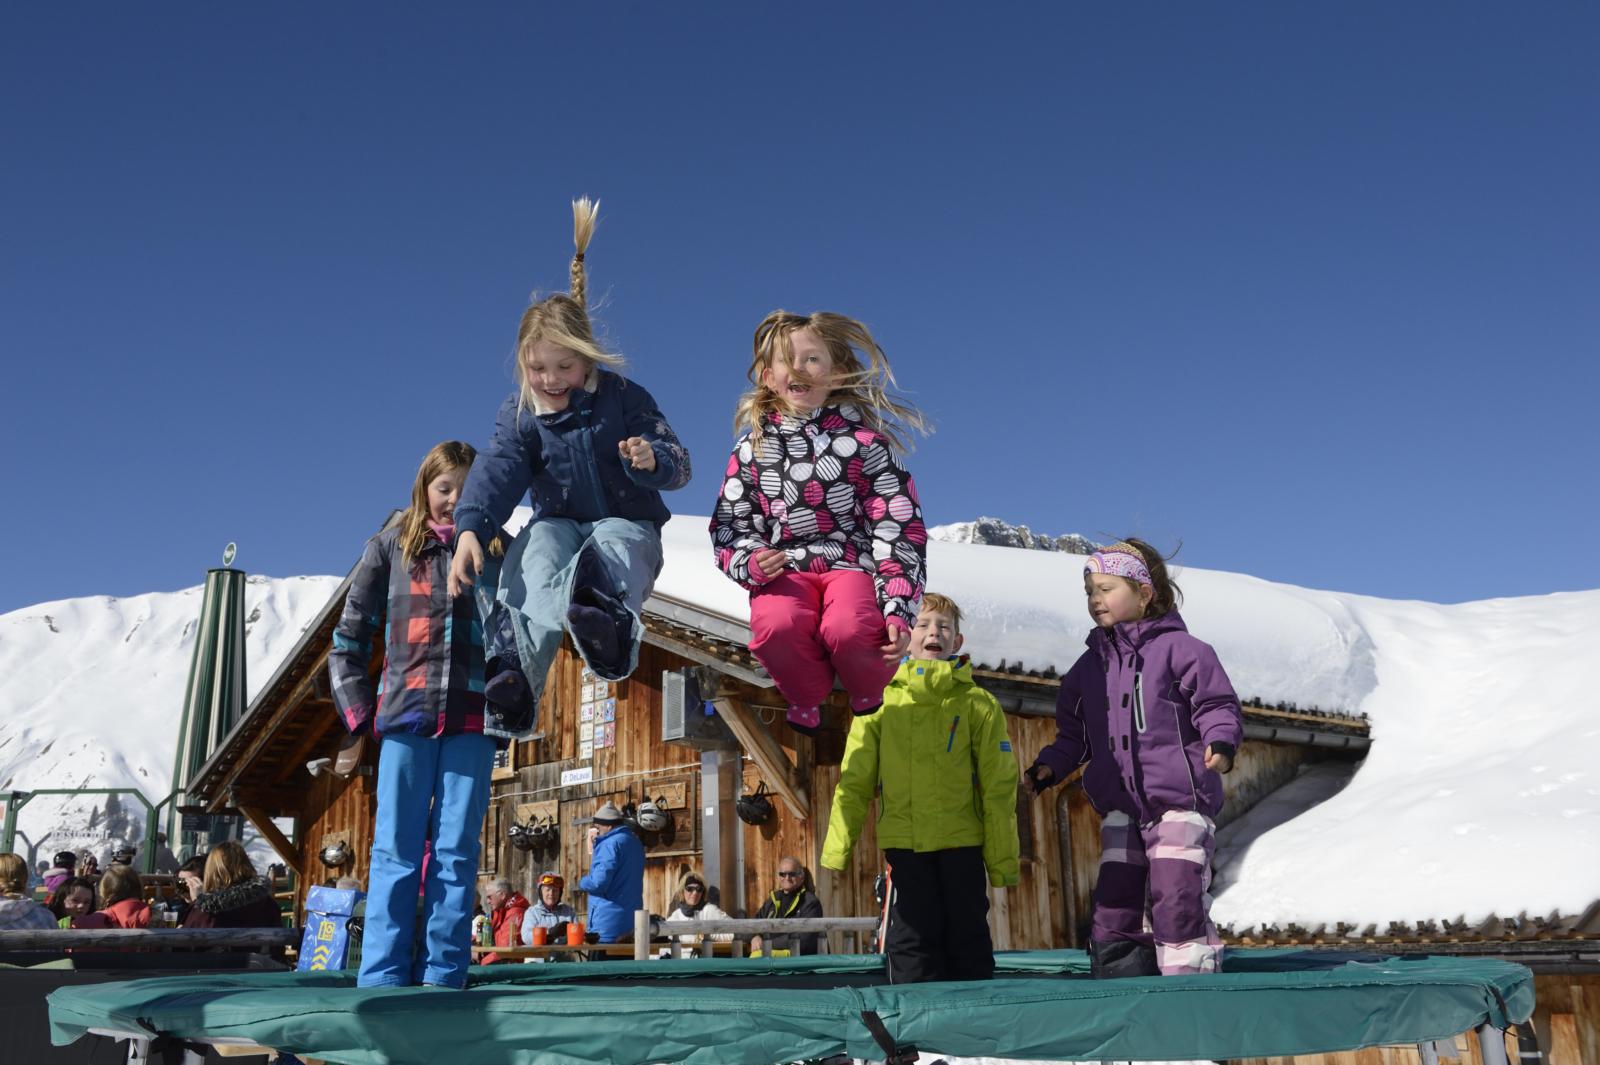 Des enfants font du trampoline chez le Haslerbar